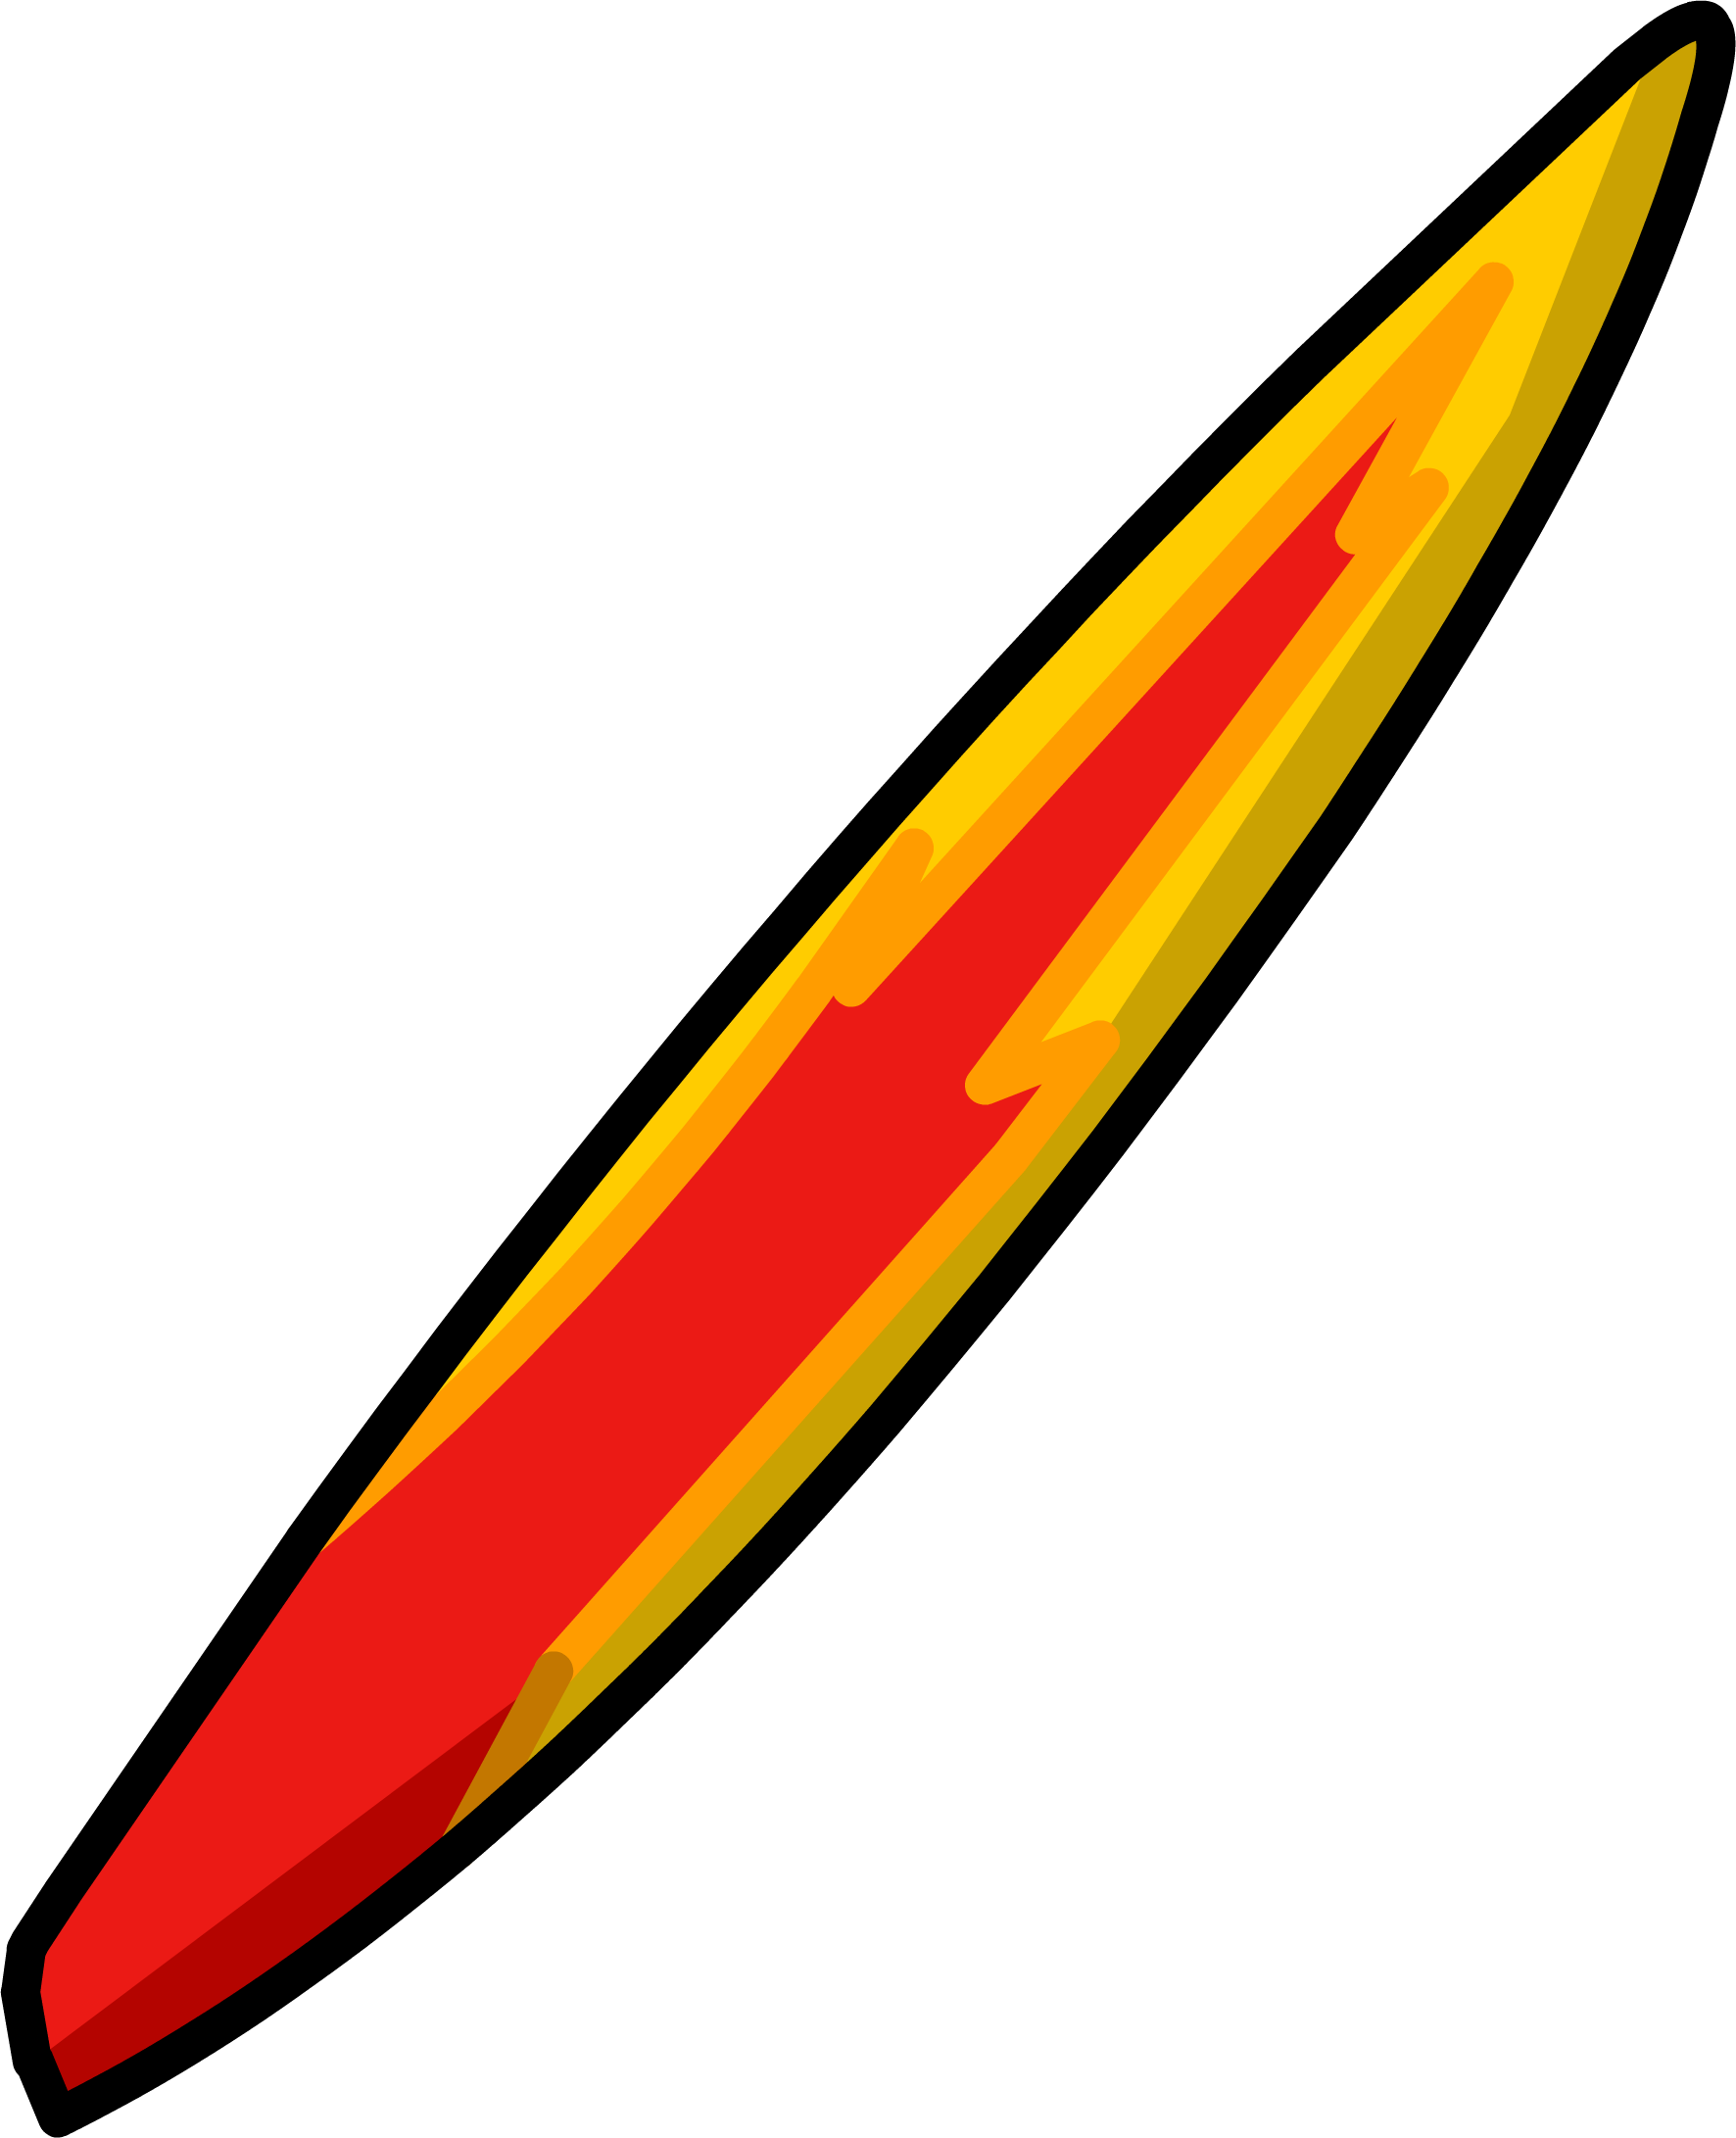 Flame Surfboard